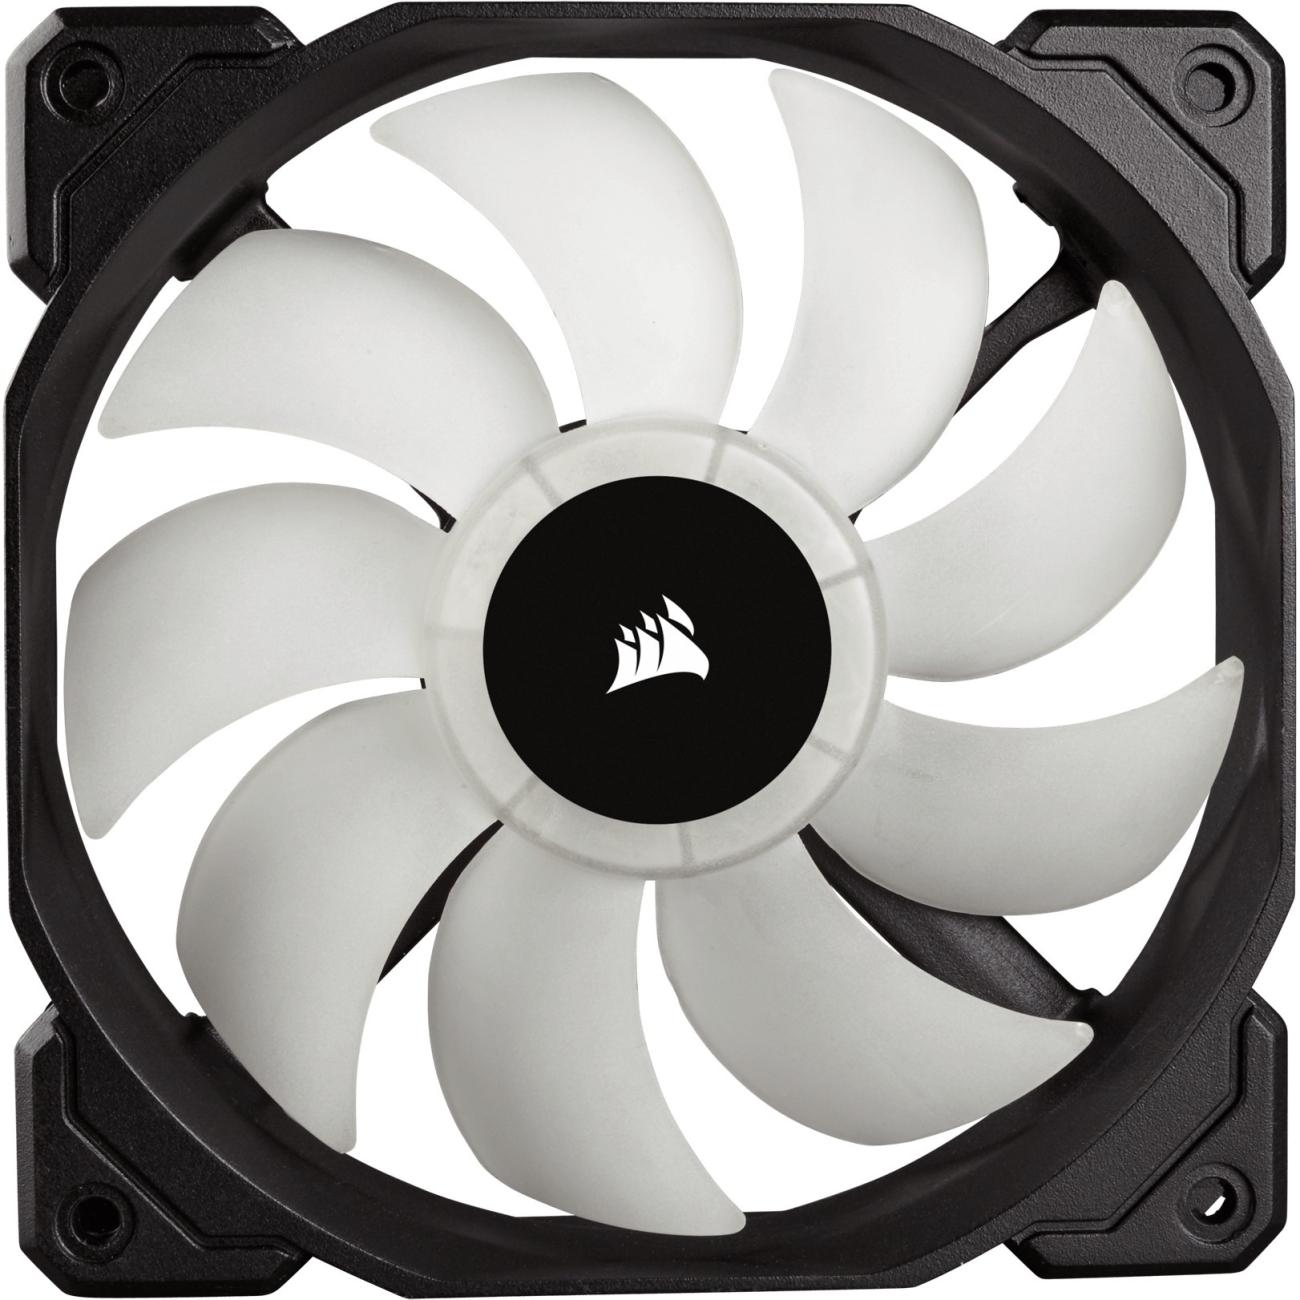 Corsair CO-9050065-WW HD Series, HD120 RGB LED, 120mm High Performance RGB LED PWM single fan, no controller - CO-9050065-WW